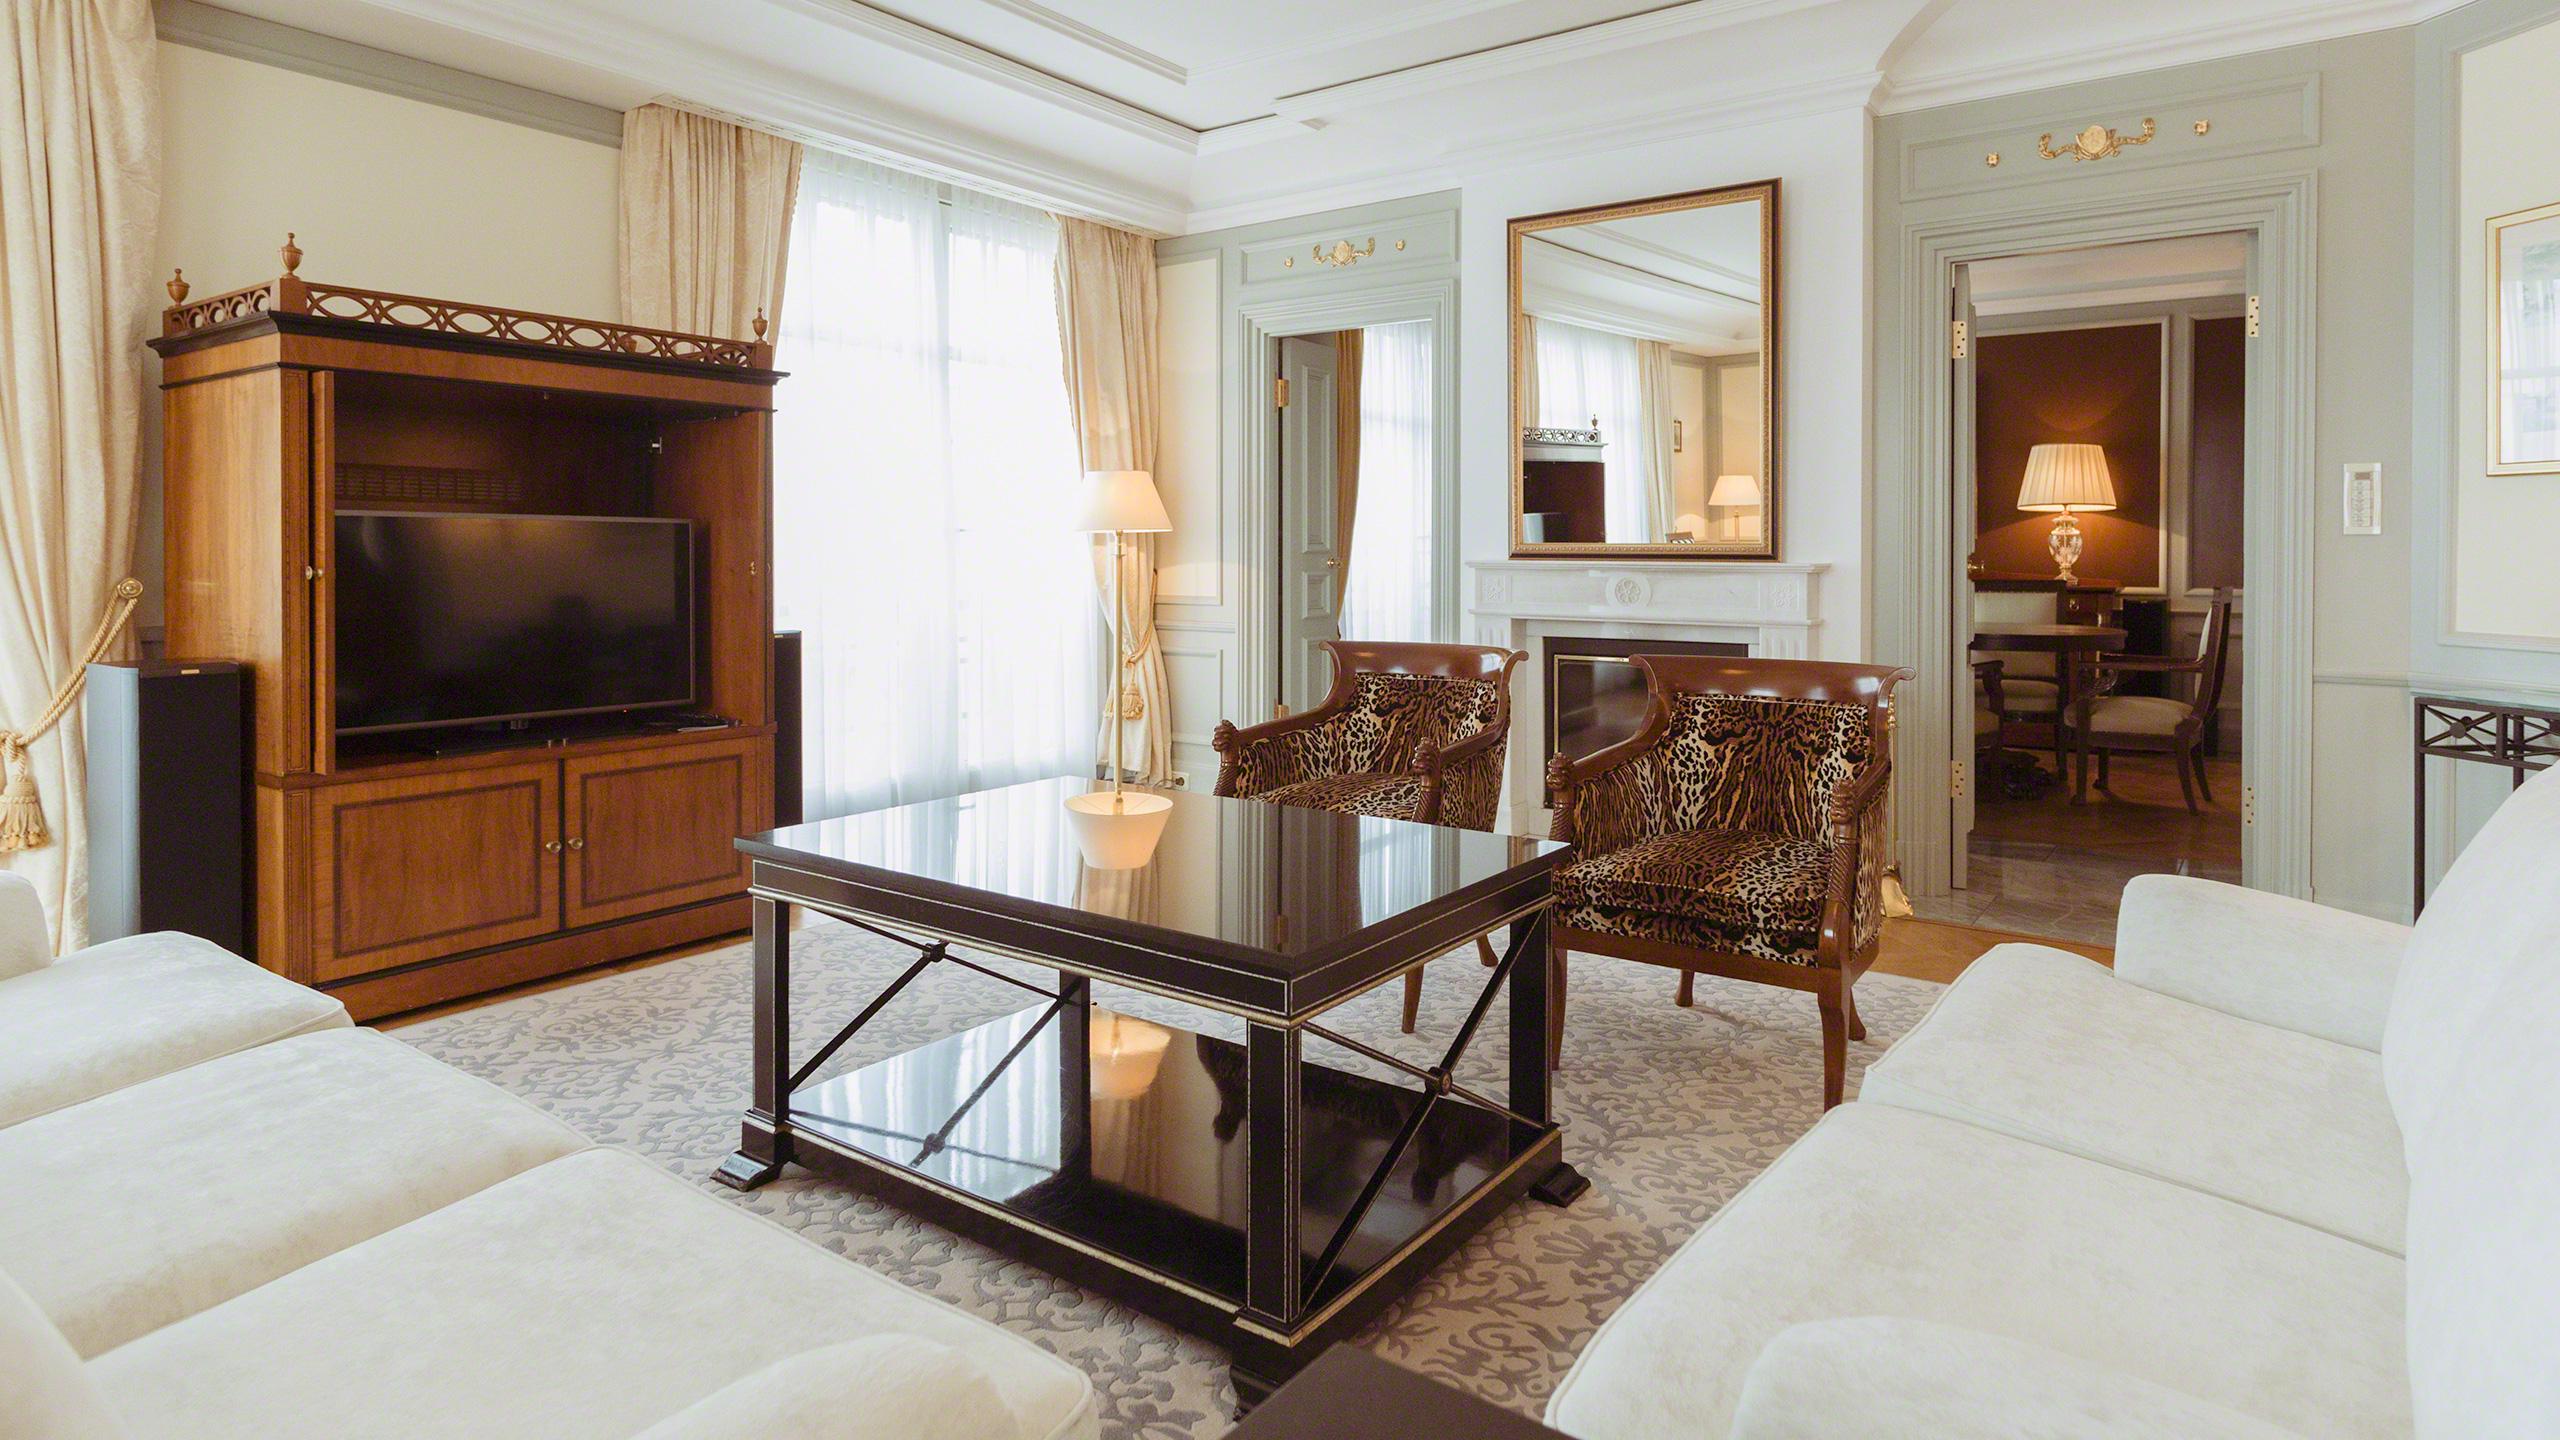 Luxushotel Adlon Kempinski Berlin Royal Suite Königs